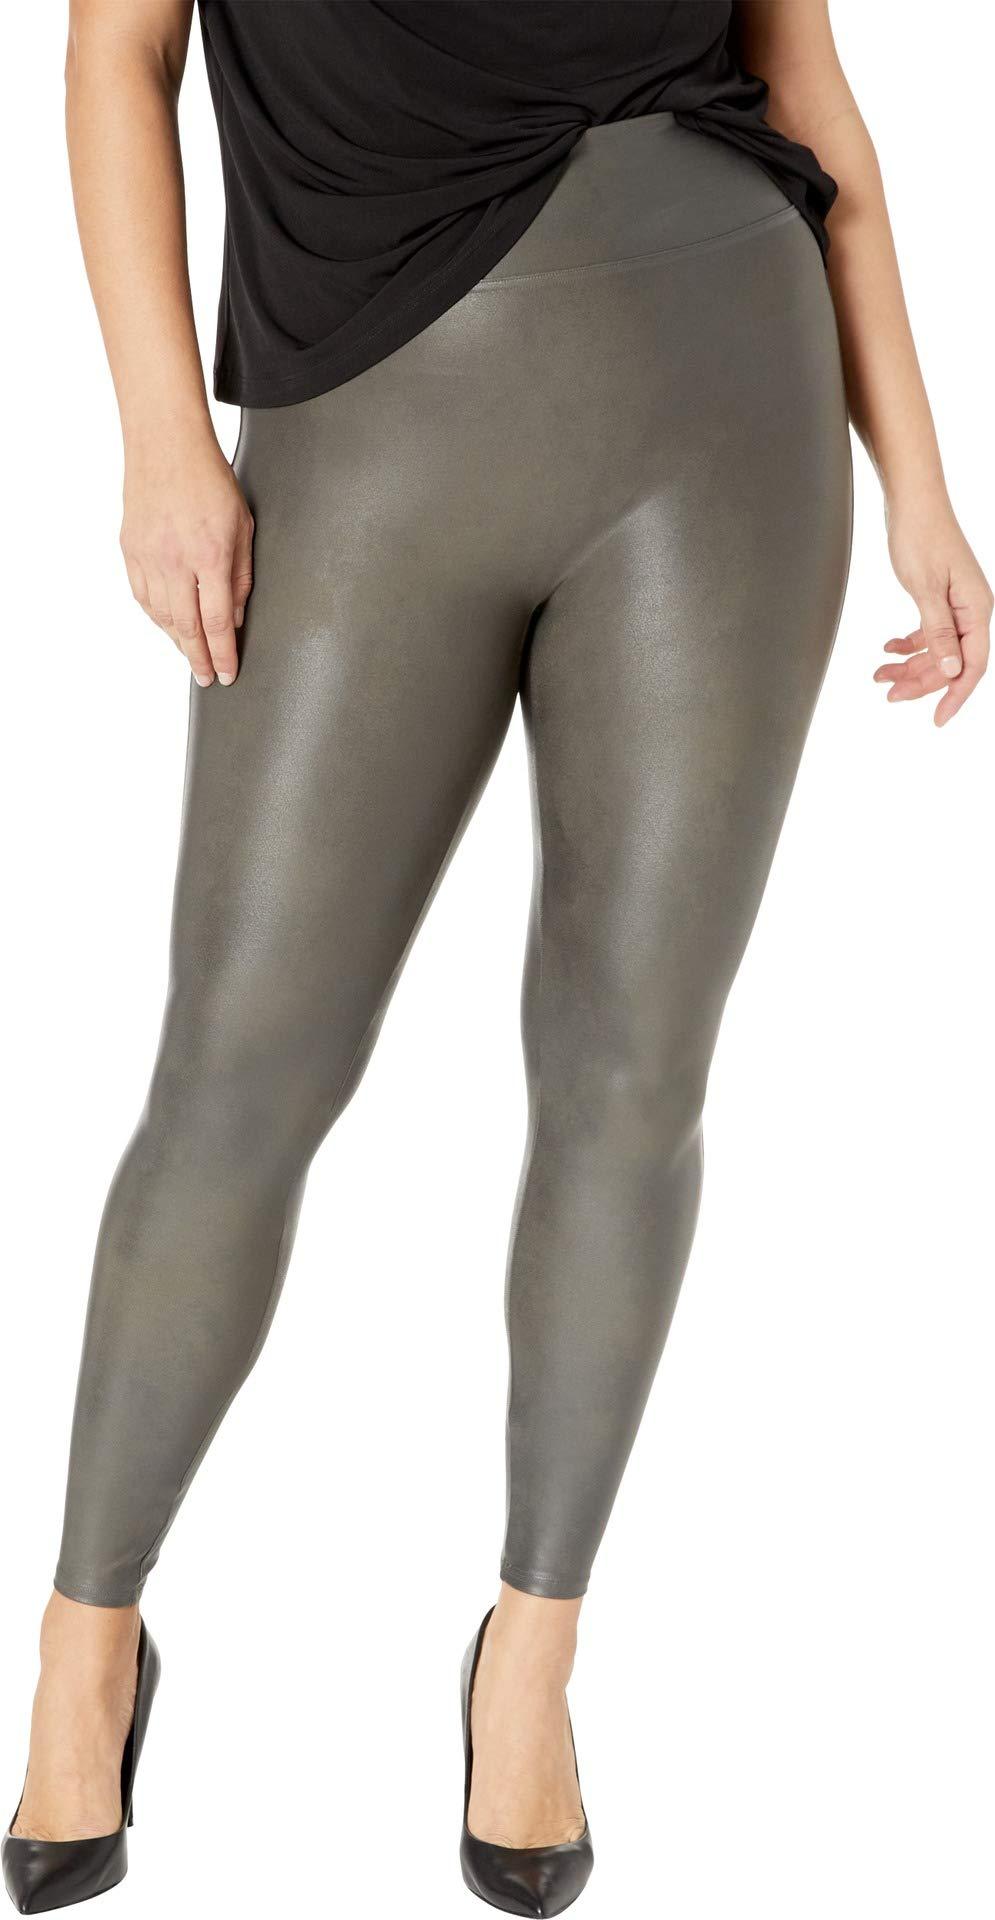 66771a33438761 Galleon - SPANX Women's Plus Size Faux Leather Leggings Gunmetal 1X 27